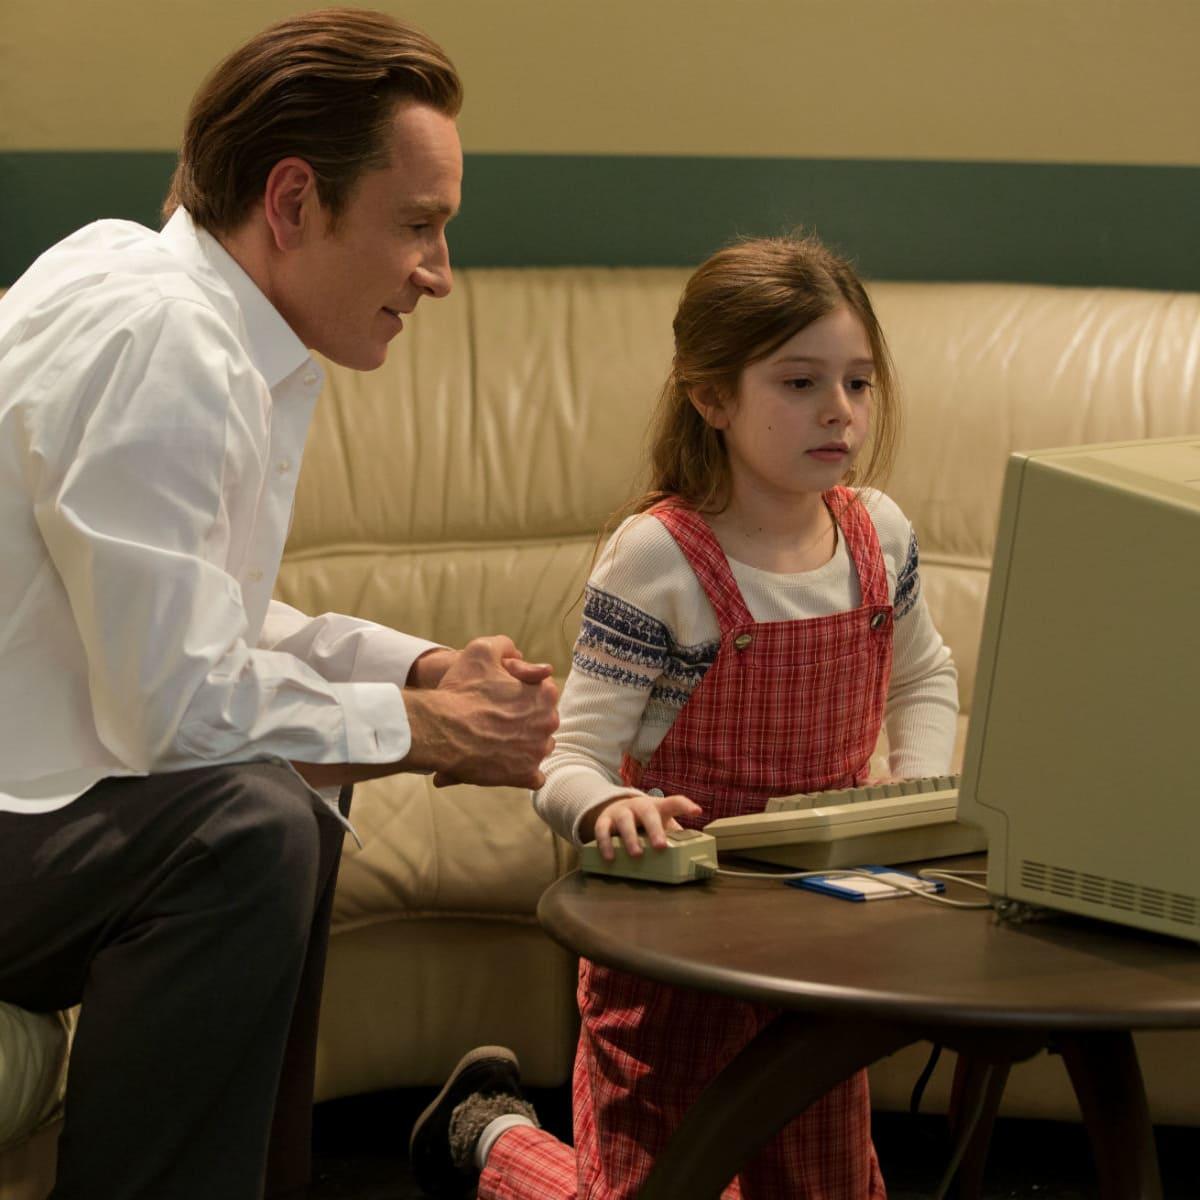 Michael Fassbender and Makenzie Moss in Steve Jobs